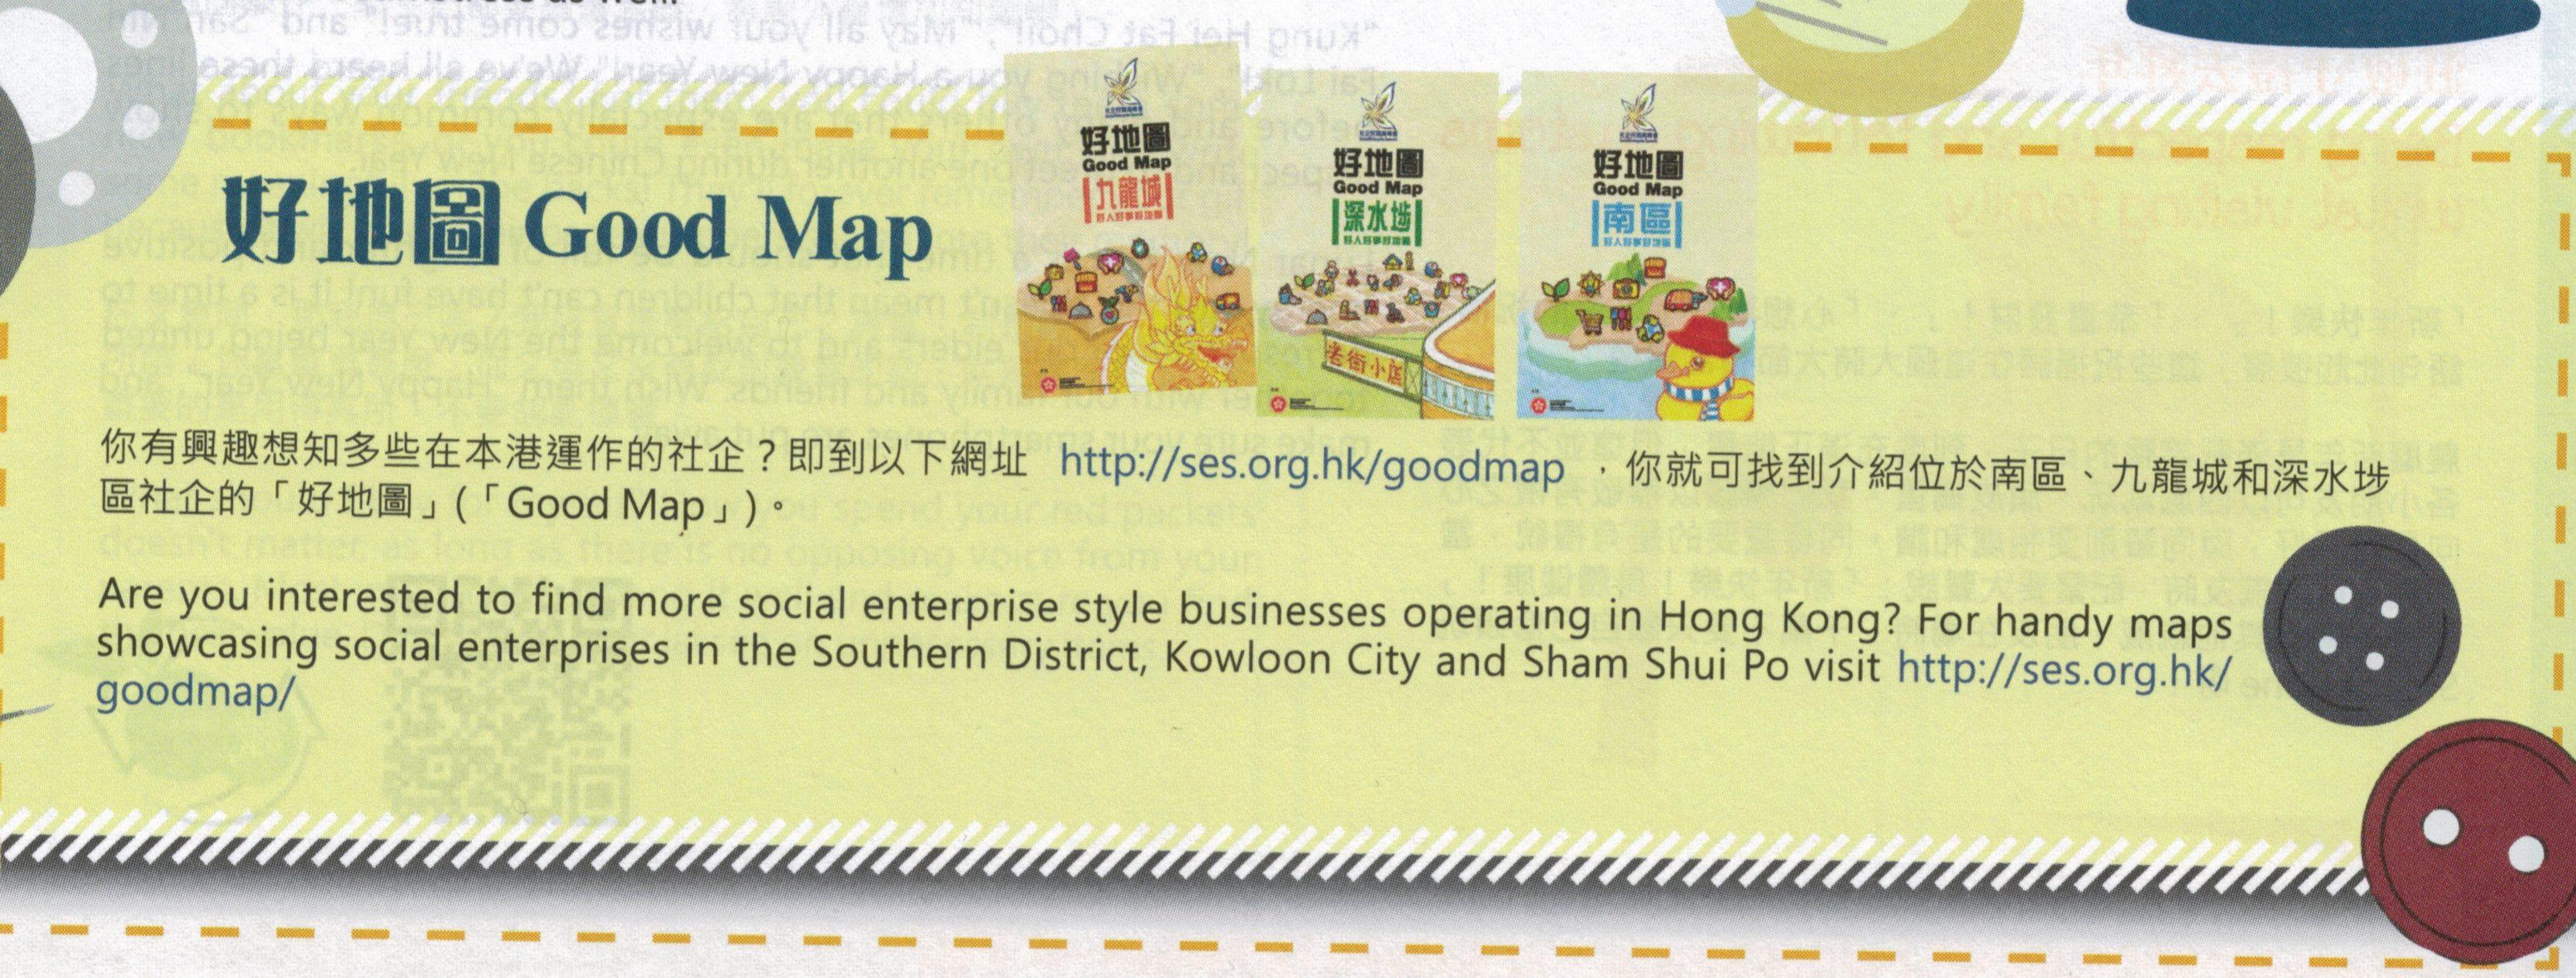 Good map 3